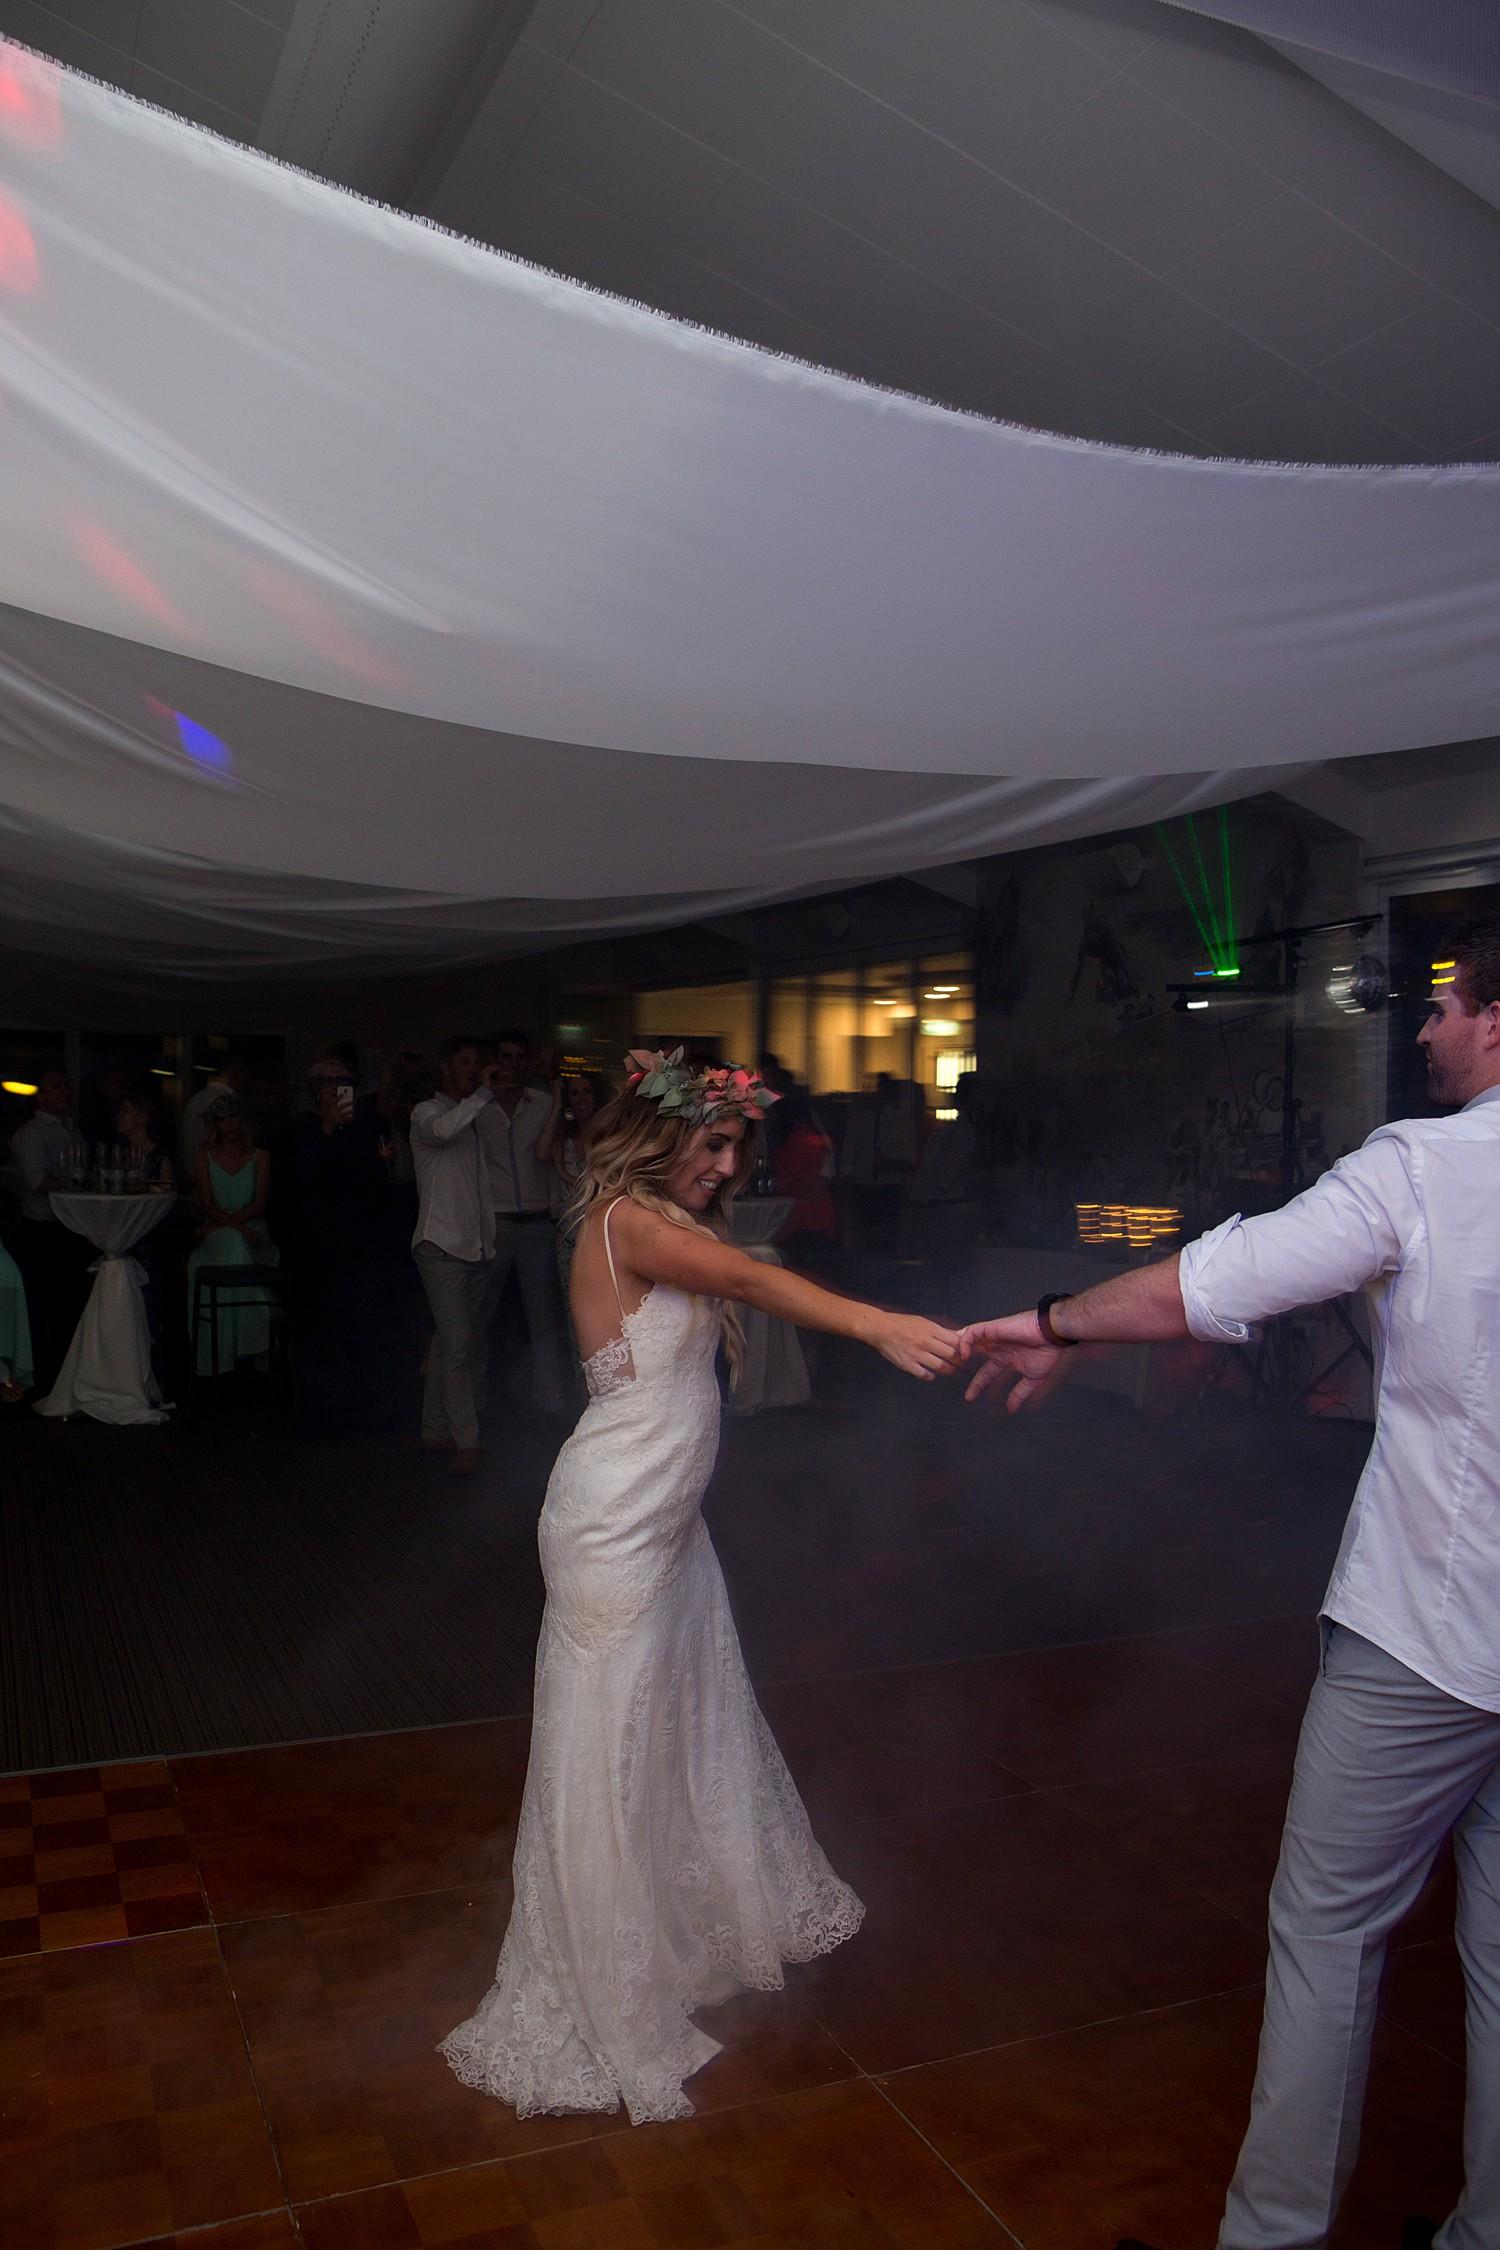 trigg_beach_wedding_perth (118).jpg